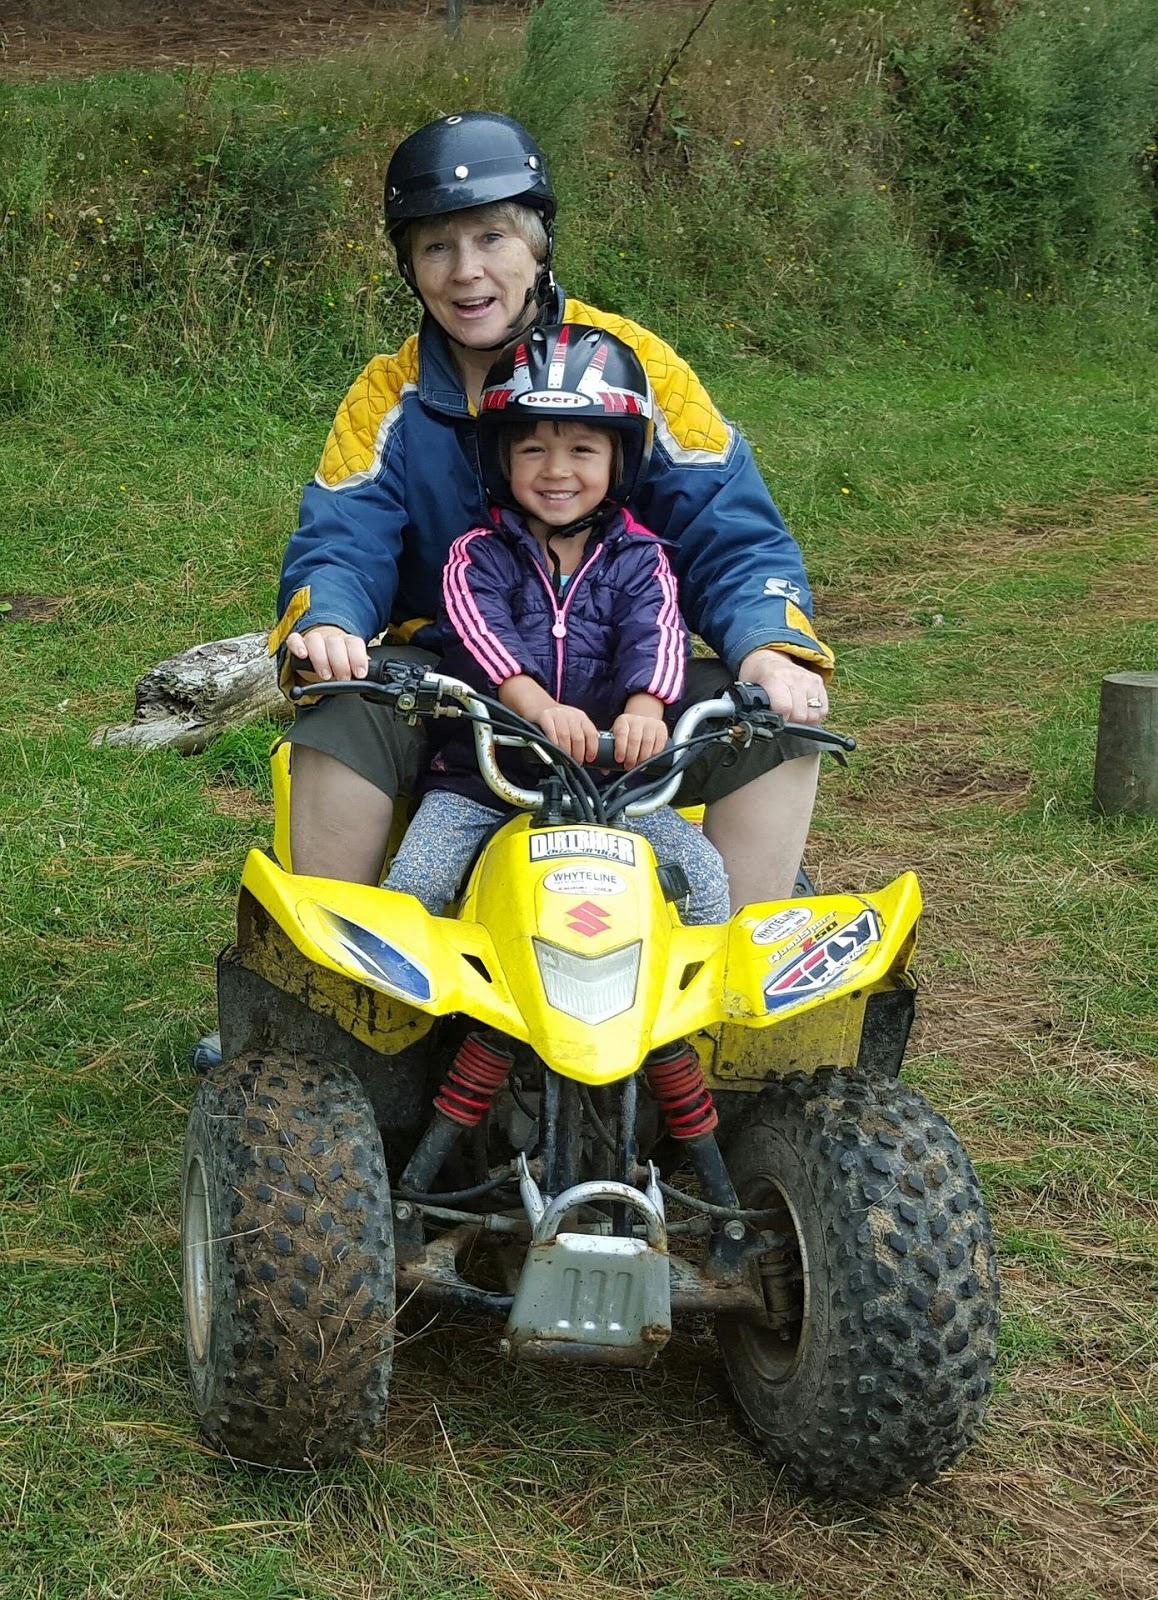 Boy and lady on a quad